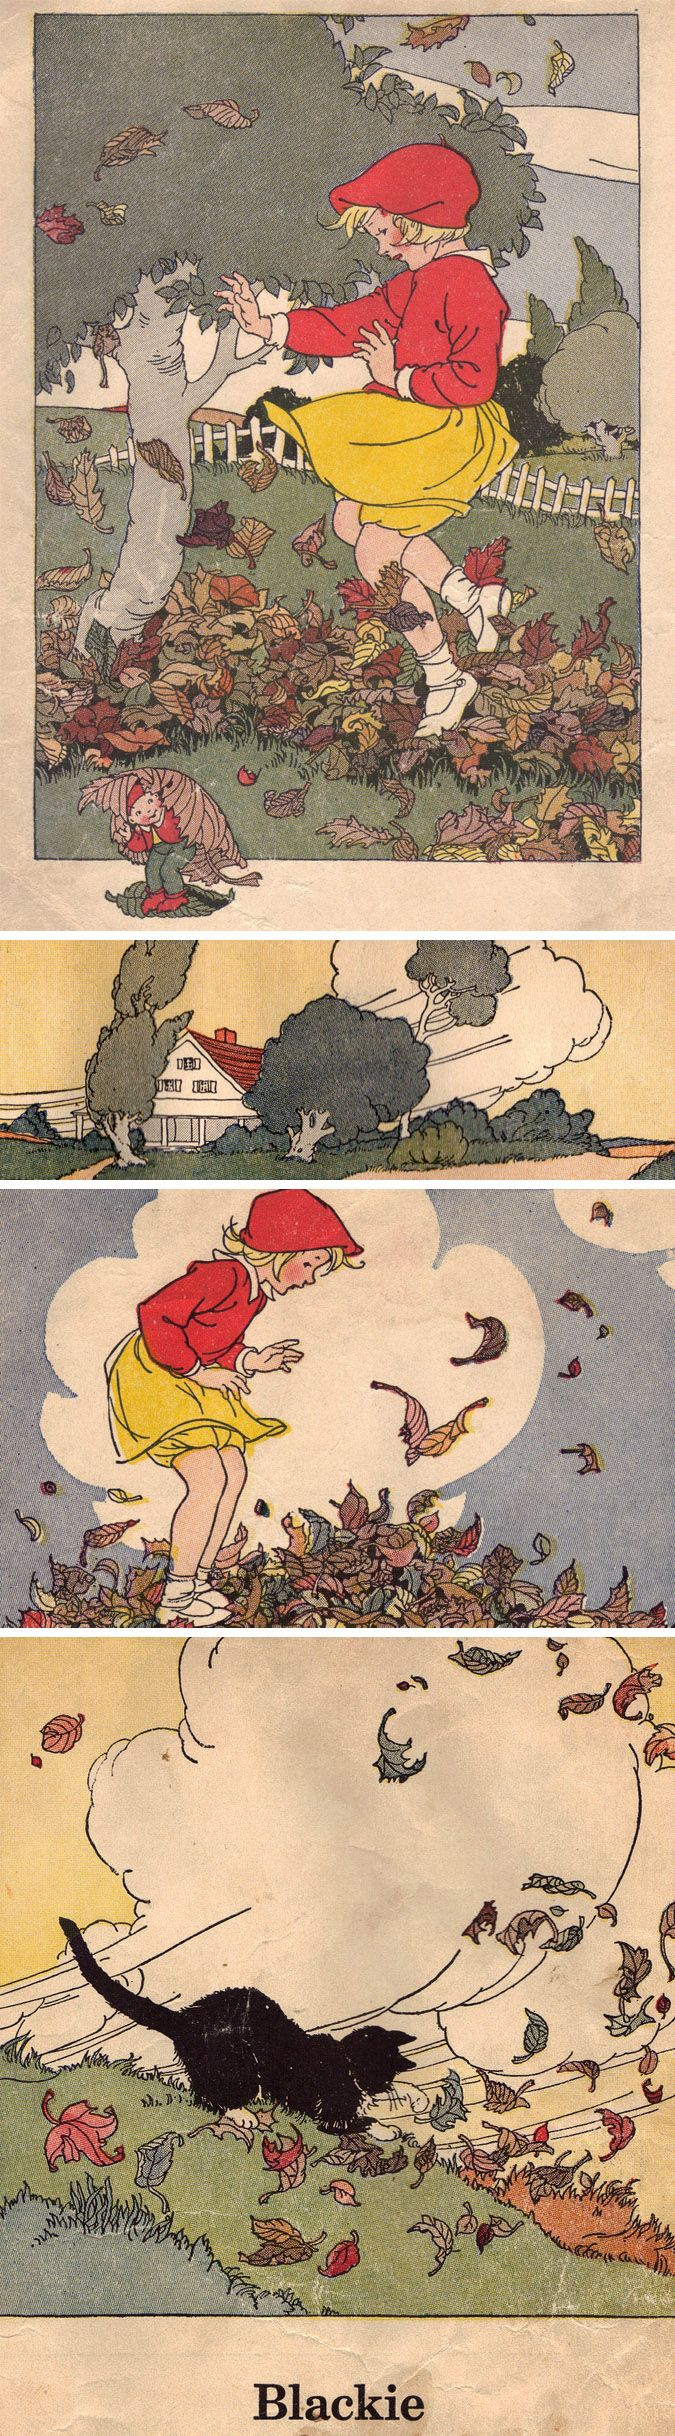 Marguerite Davis Illustrations. Reminds me of Little Sallie Mandy illustrated by Bess Goe Willis...